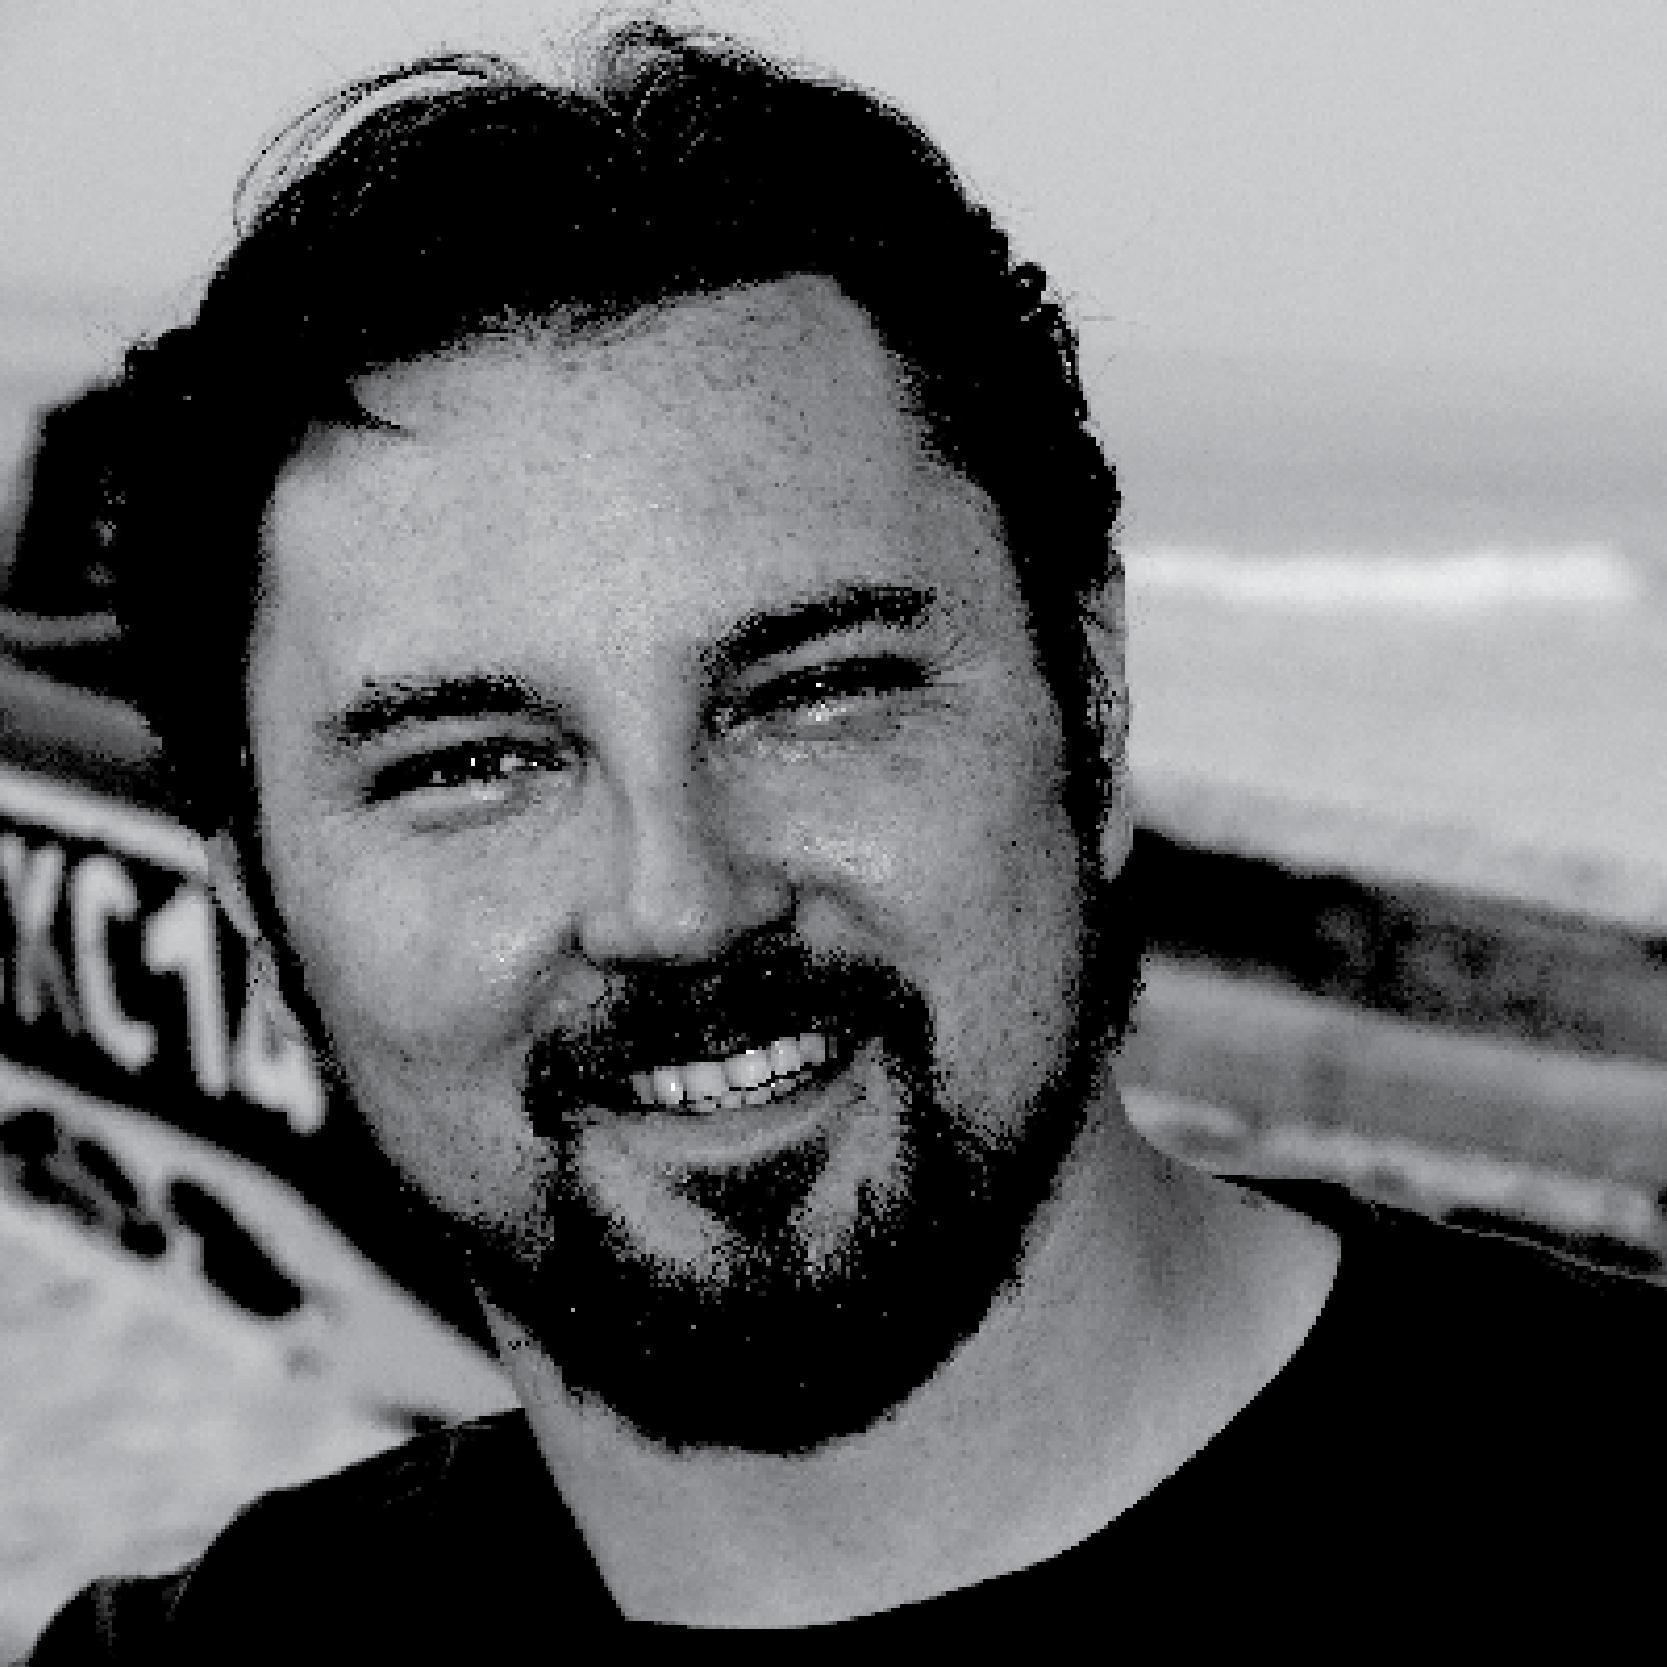 Daniel Homorodean